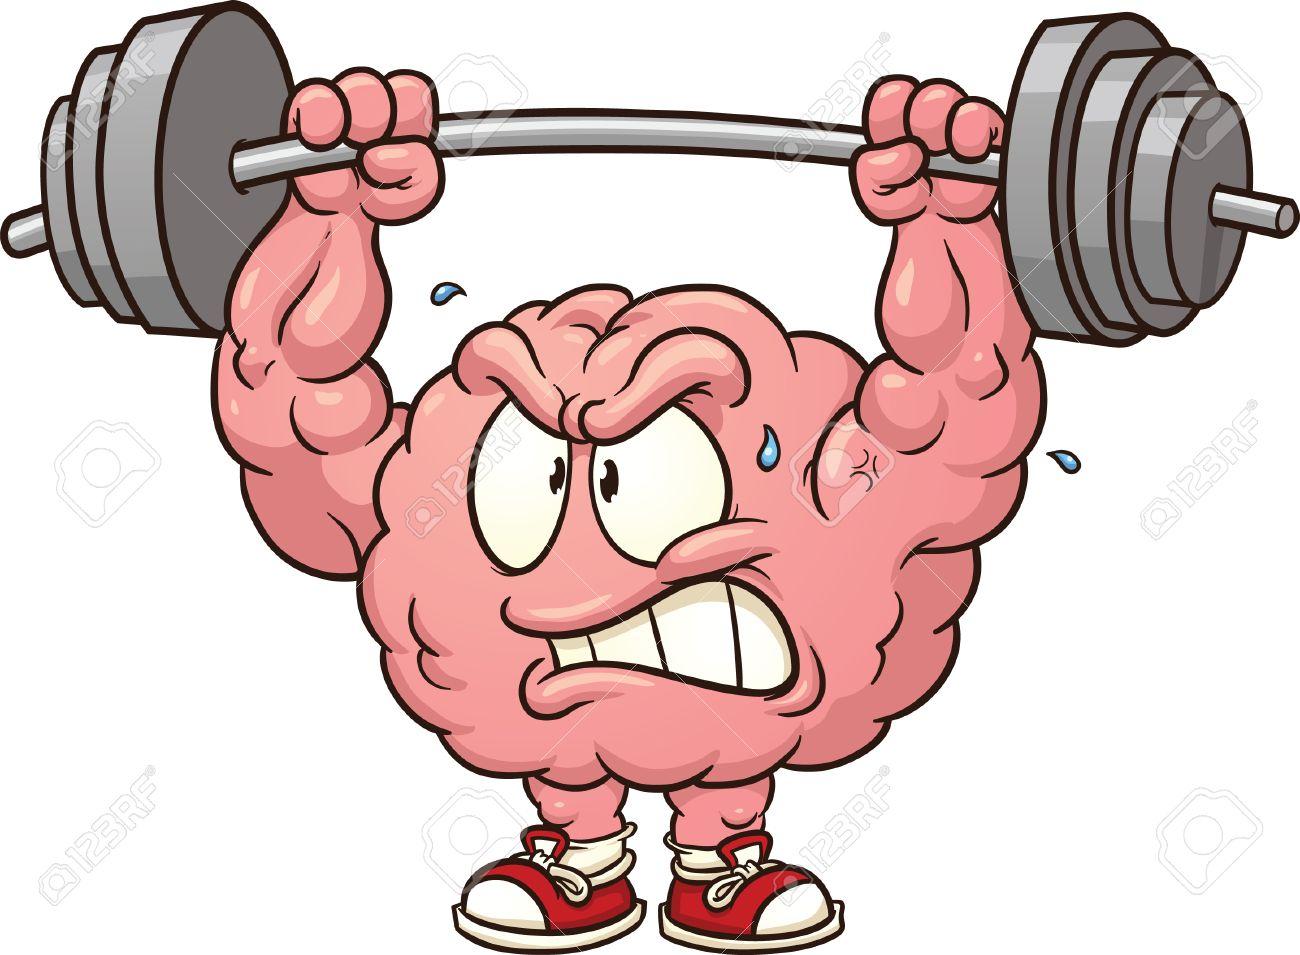 1300x955 Strong Weightlifting Brain Clip Art Vector Cartoon Illustration